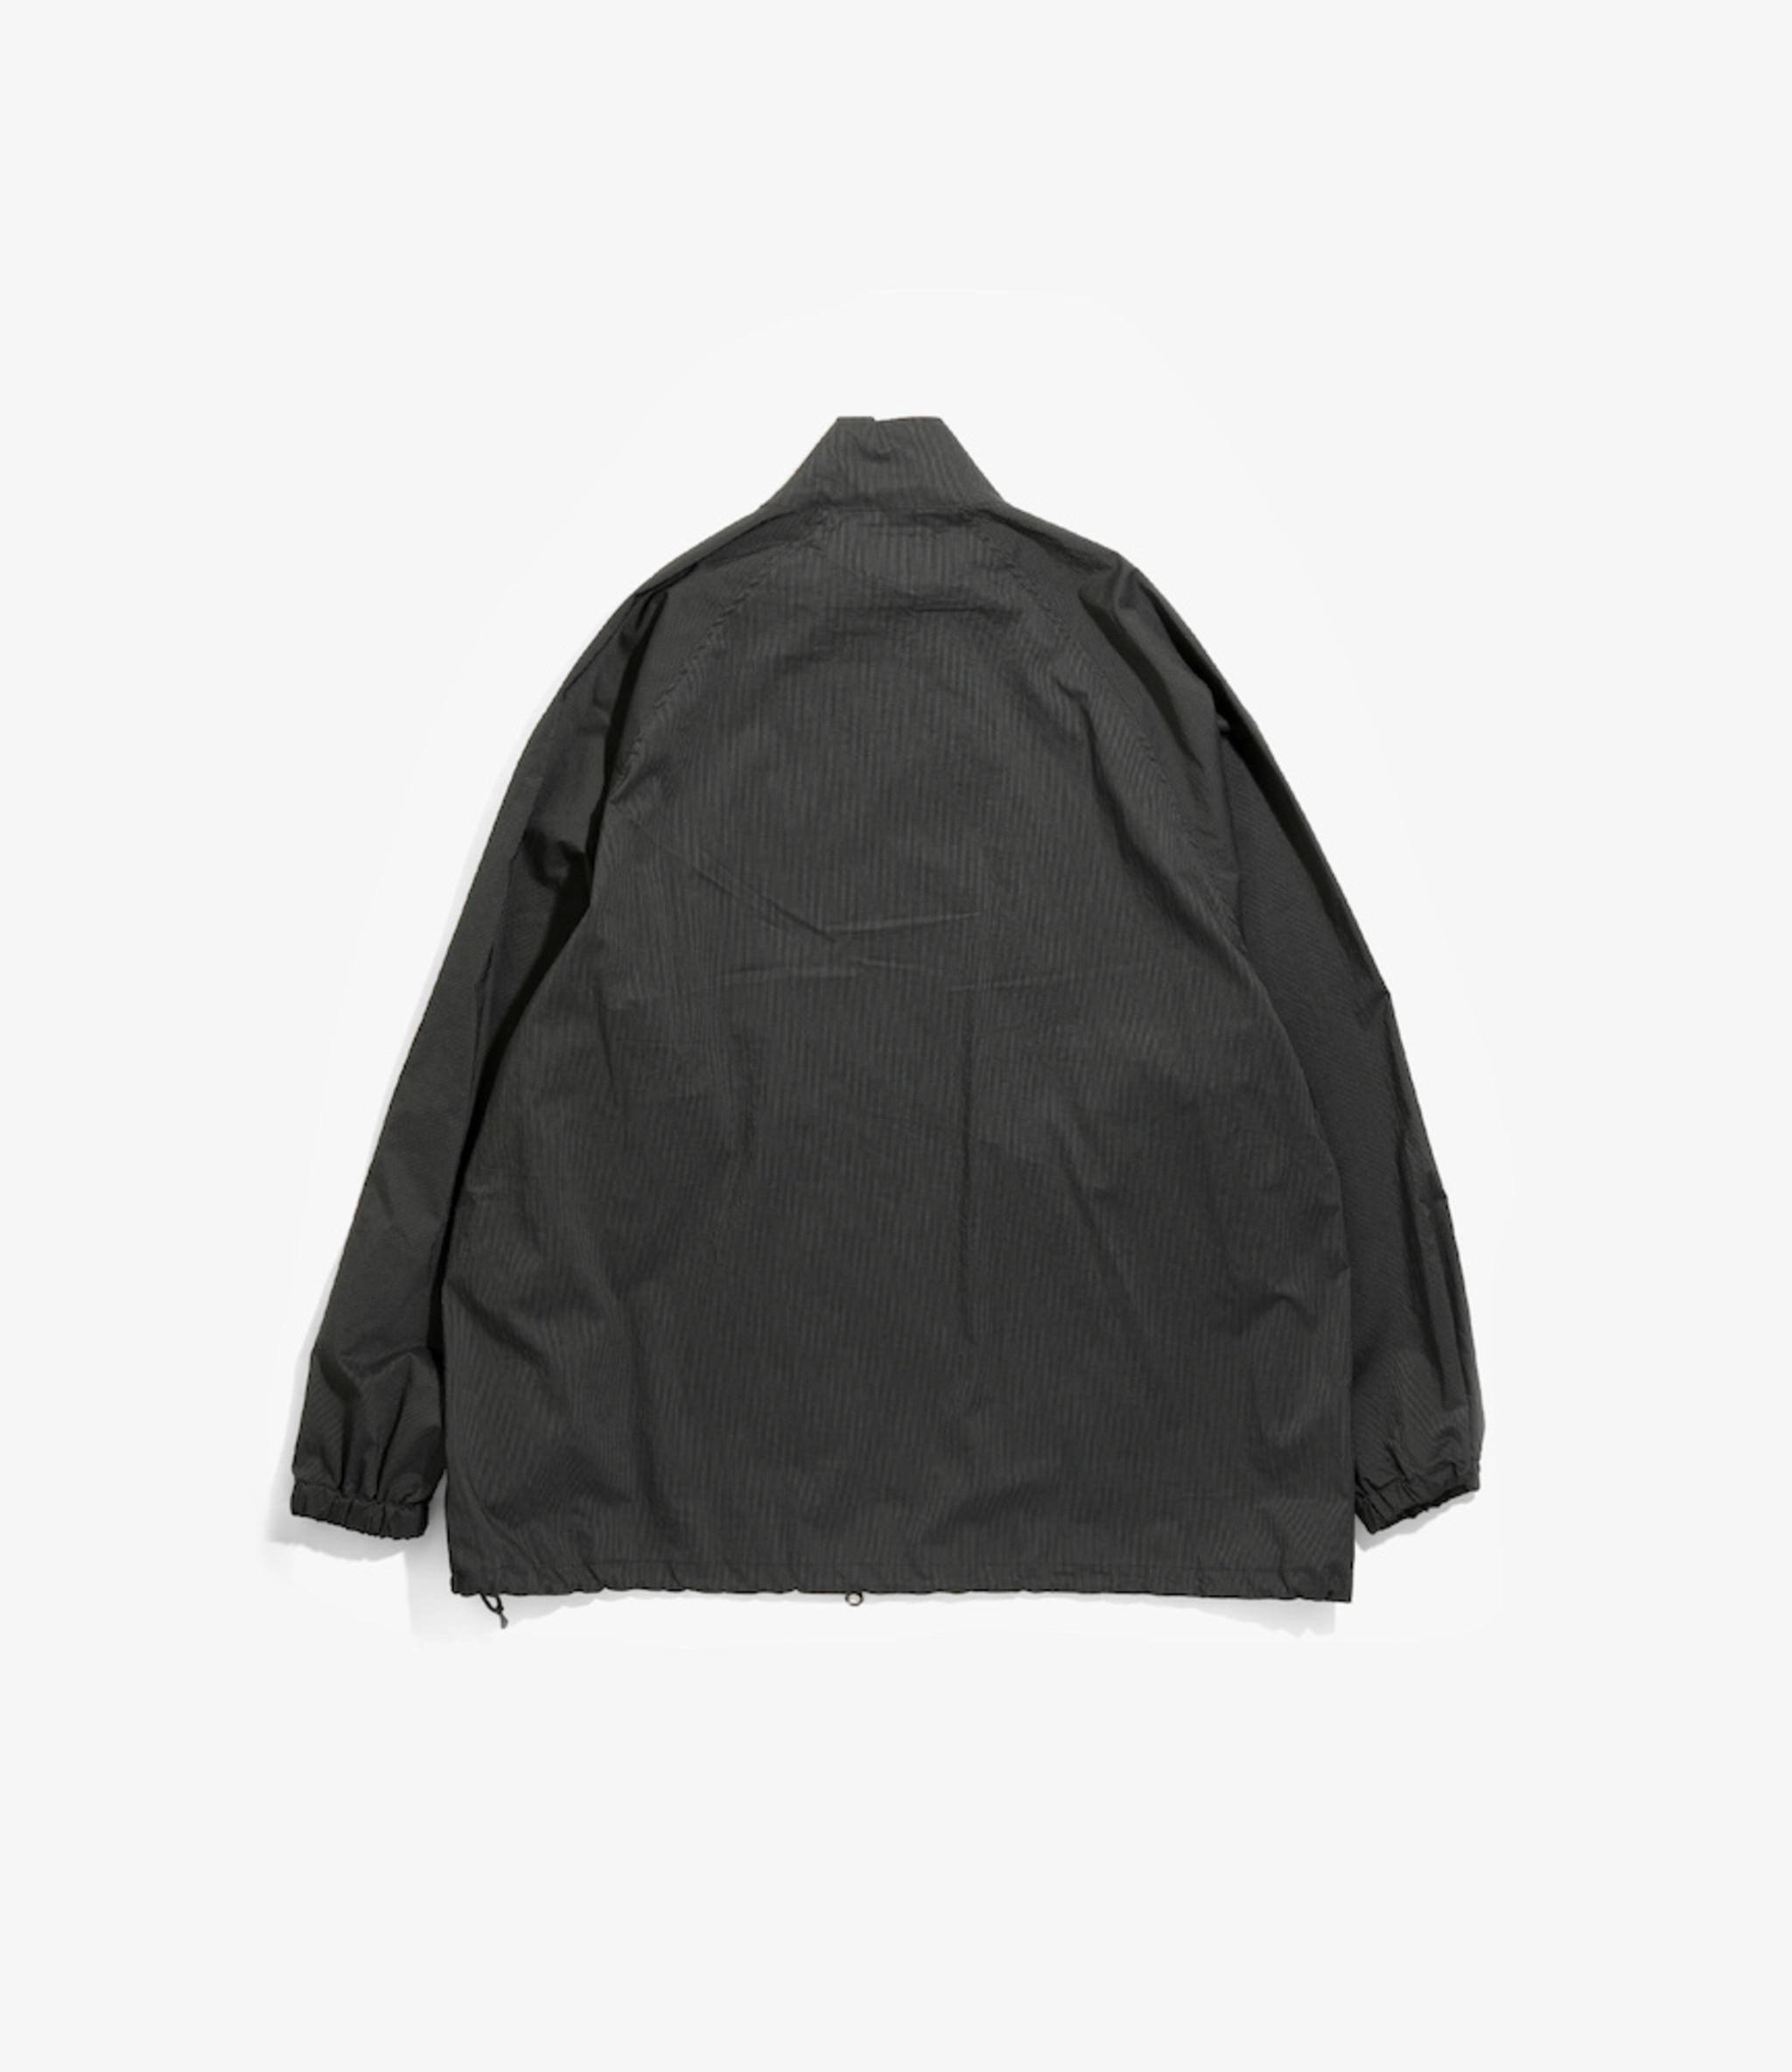 Needles Jog Jacket - Nylon Iridescent Stripe - Charcoal